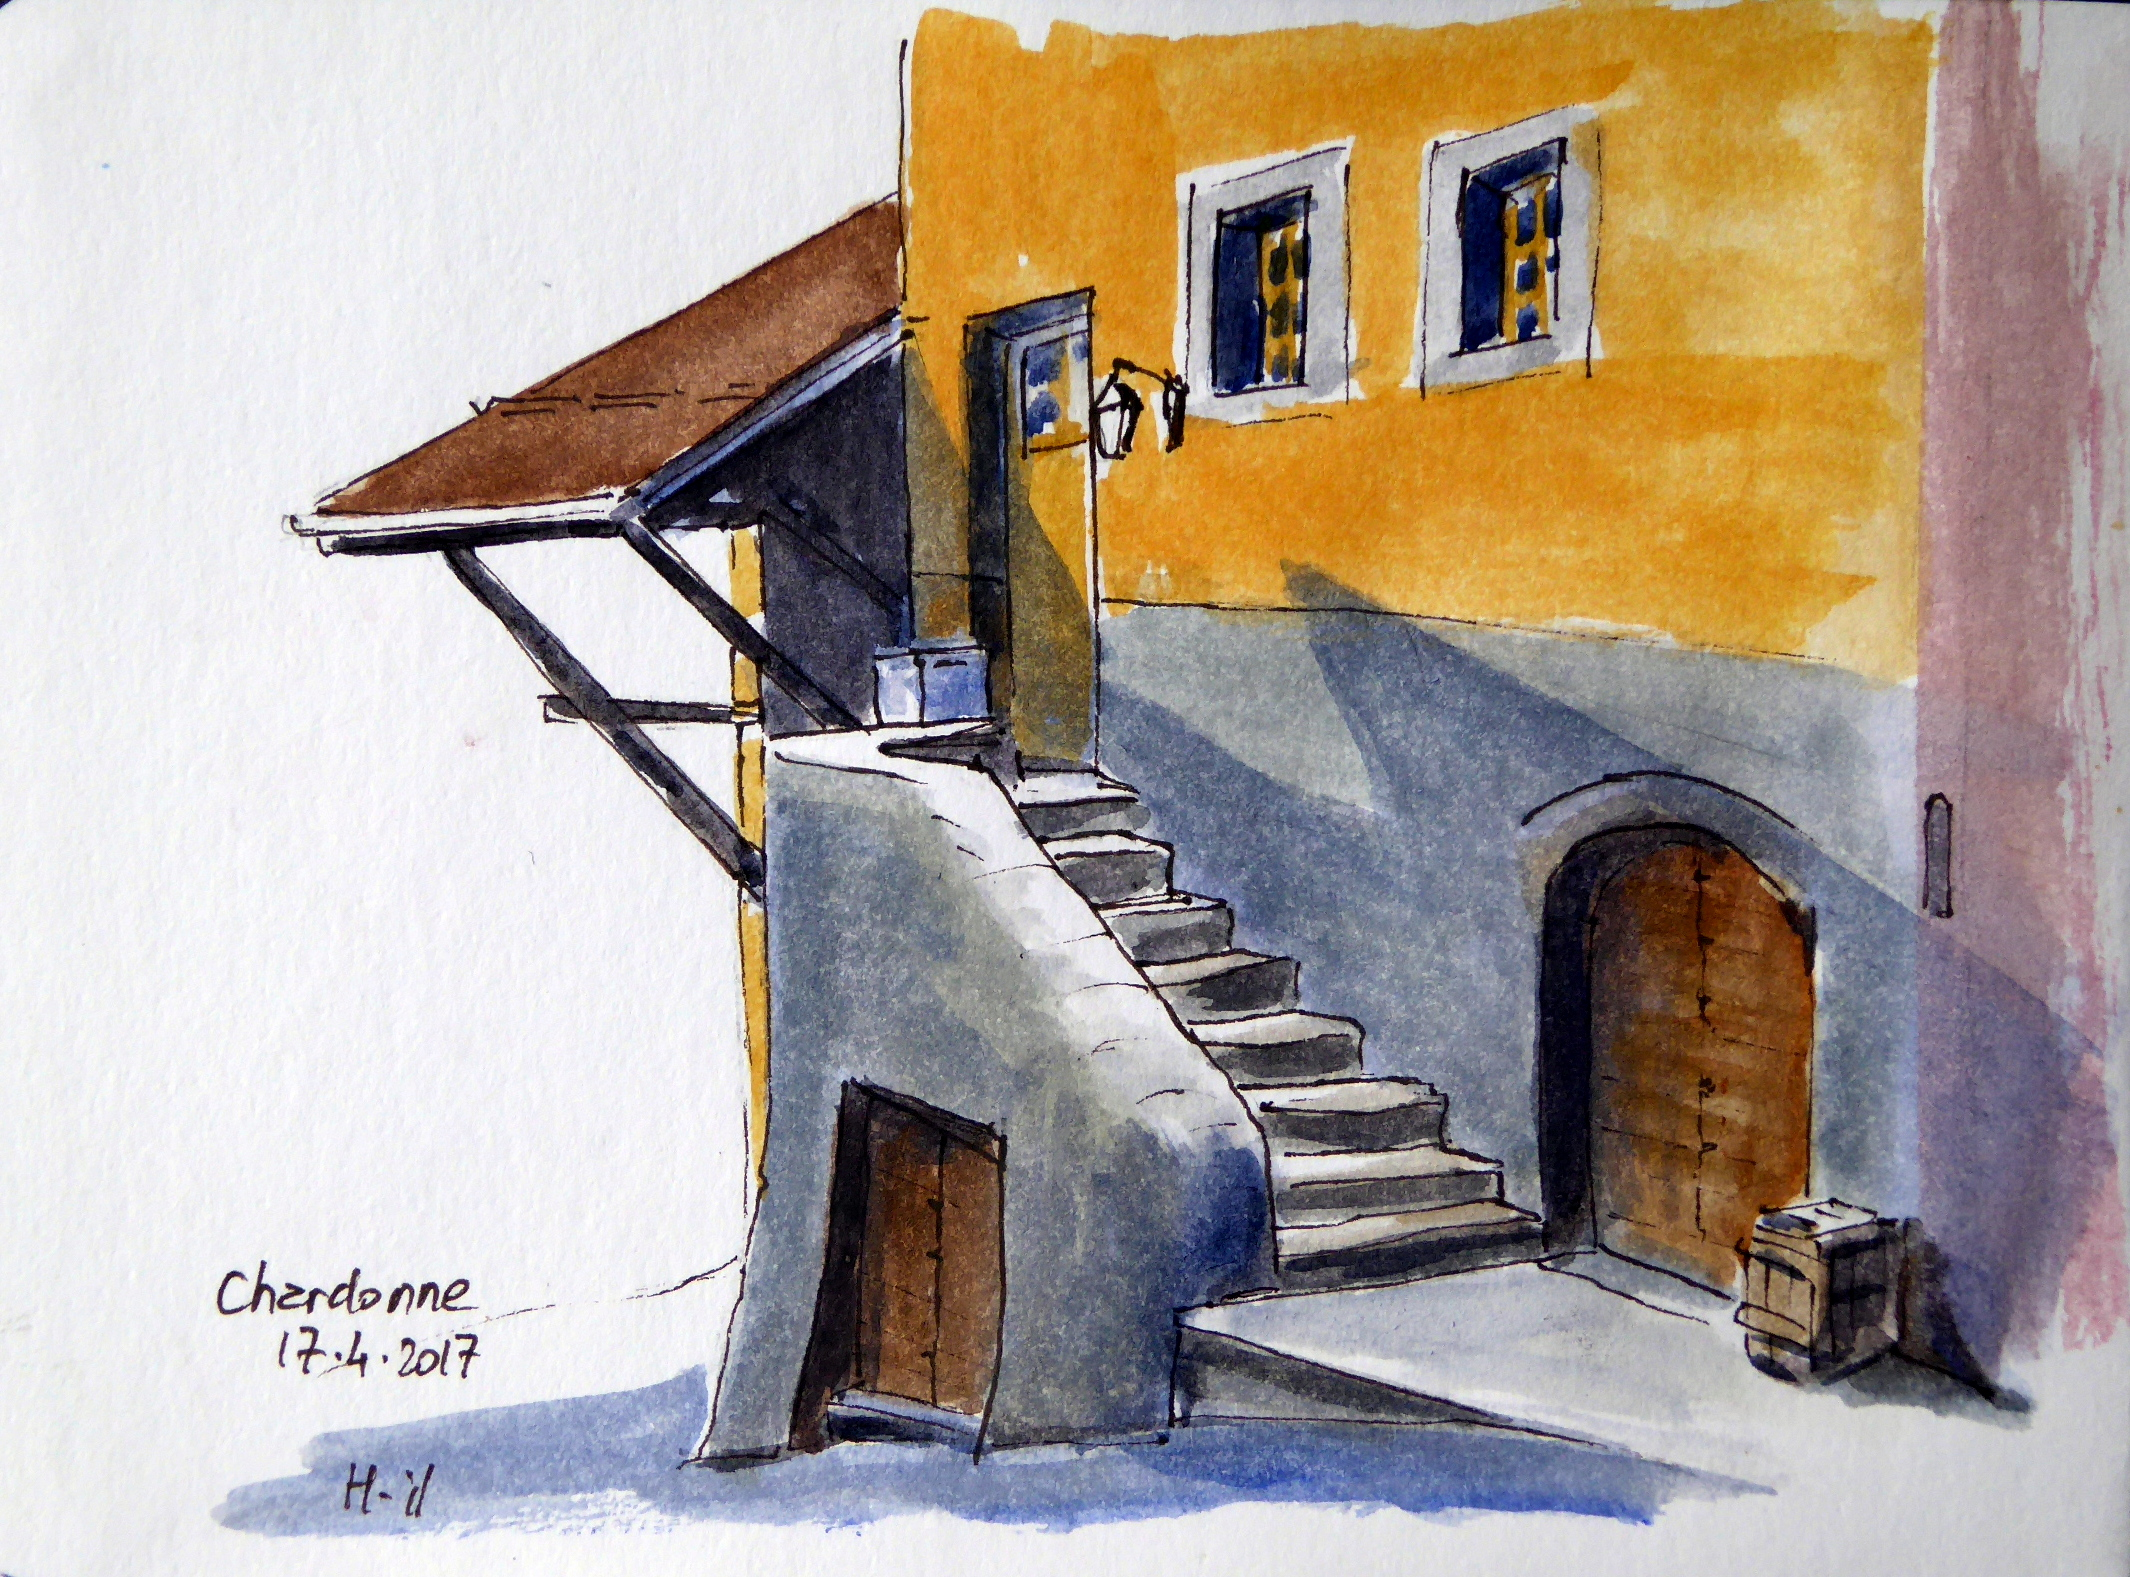 Chardonne escalier